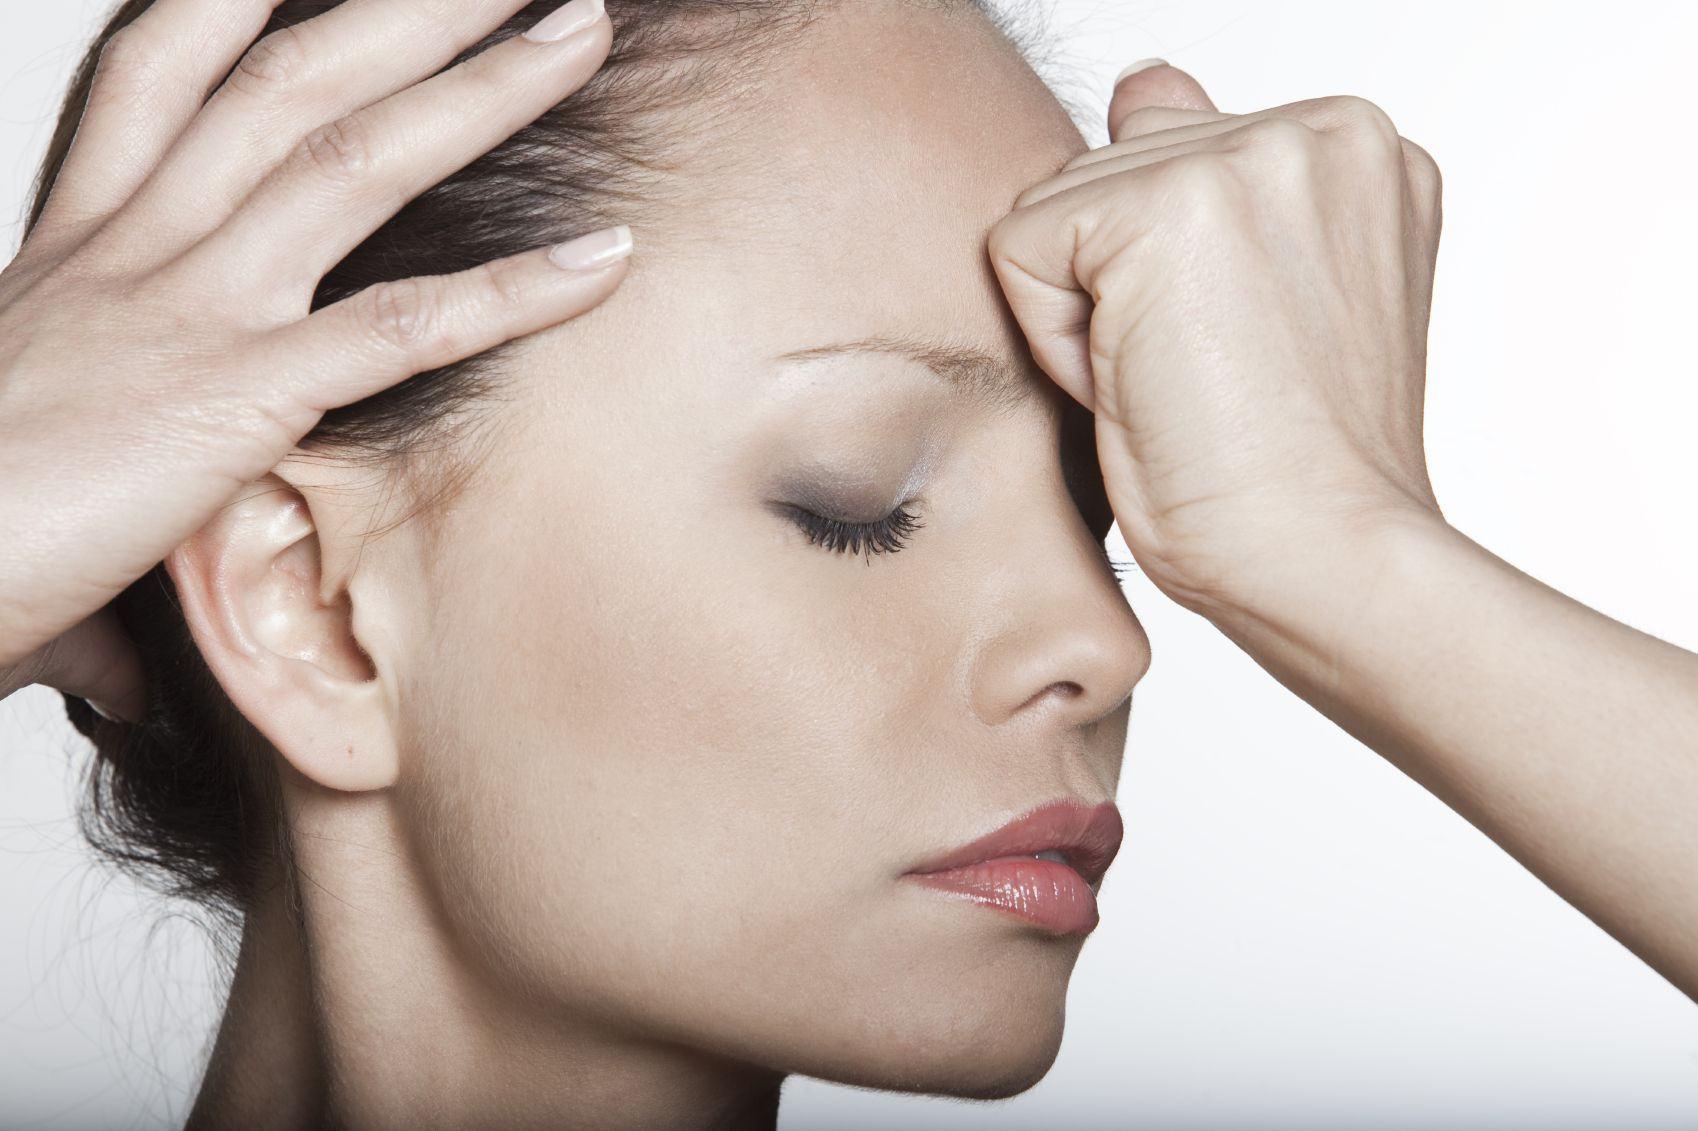 Say goodbye to chronic migraine pain